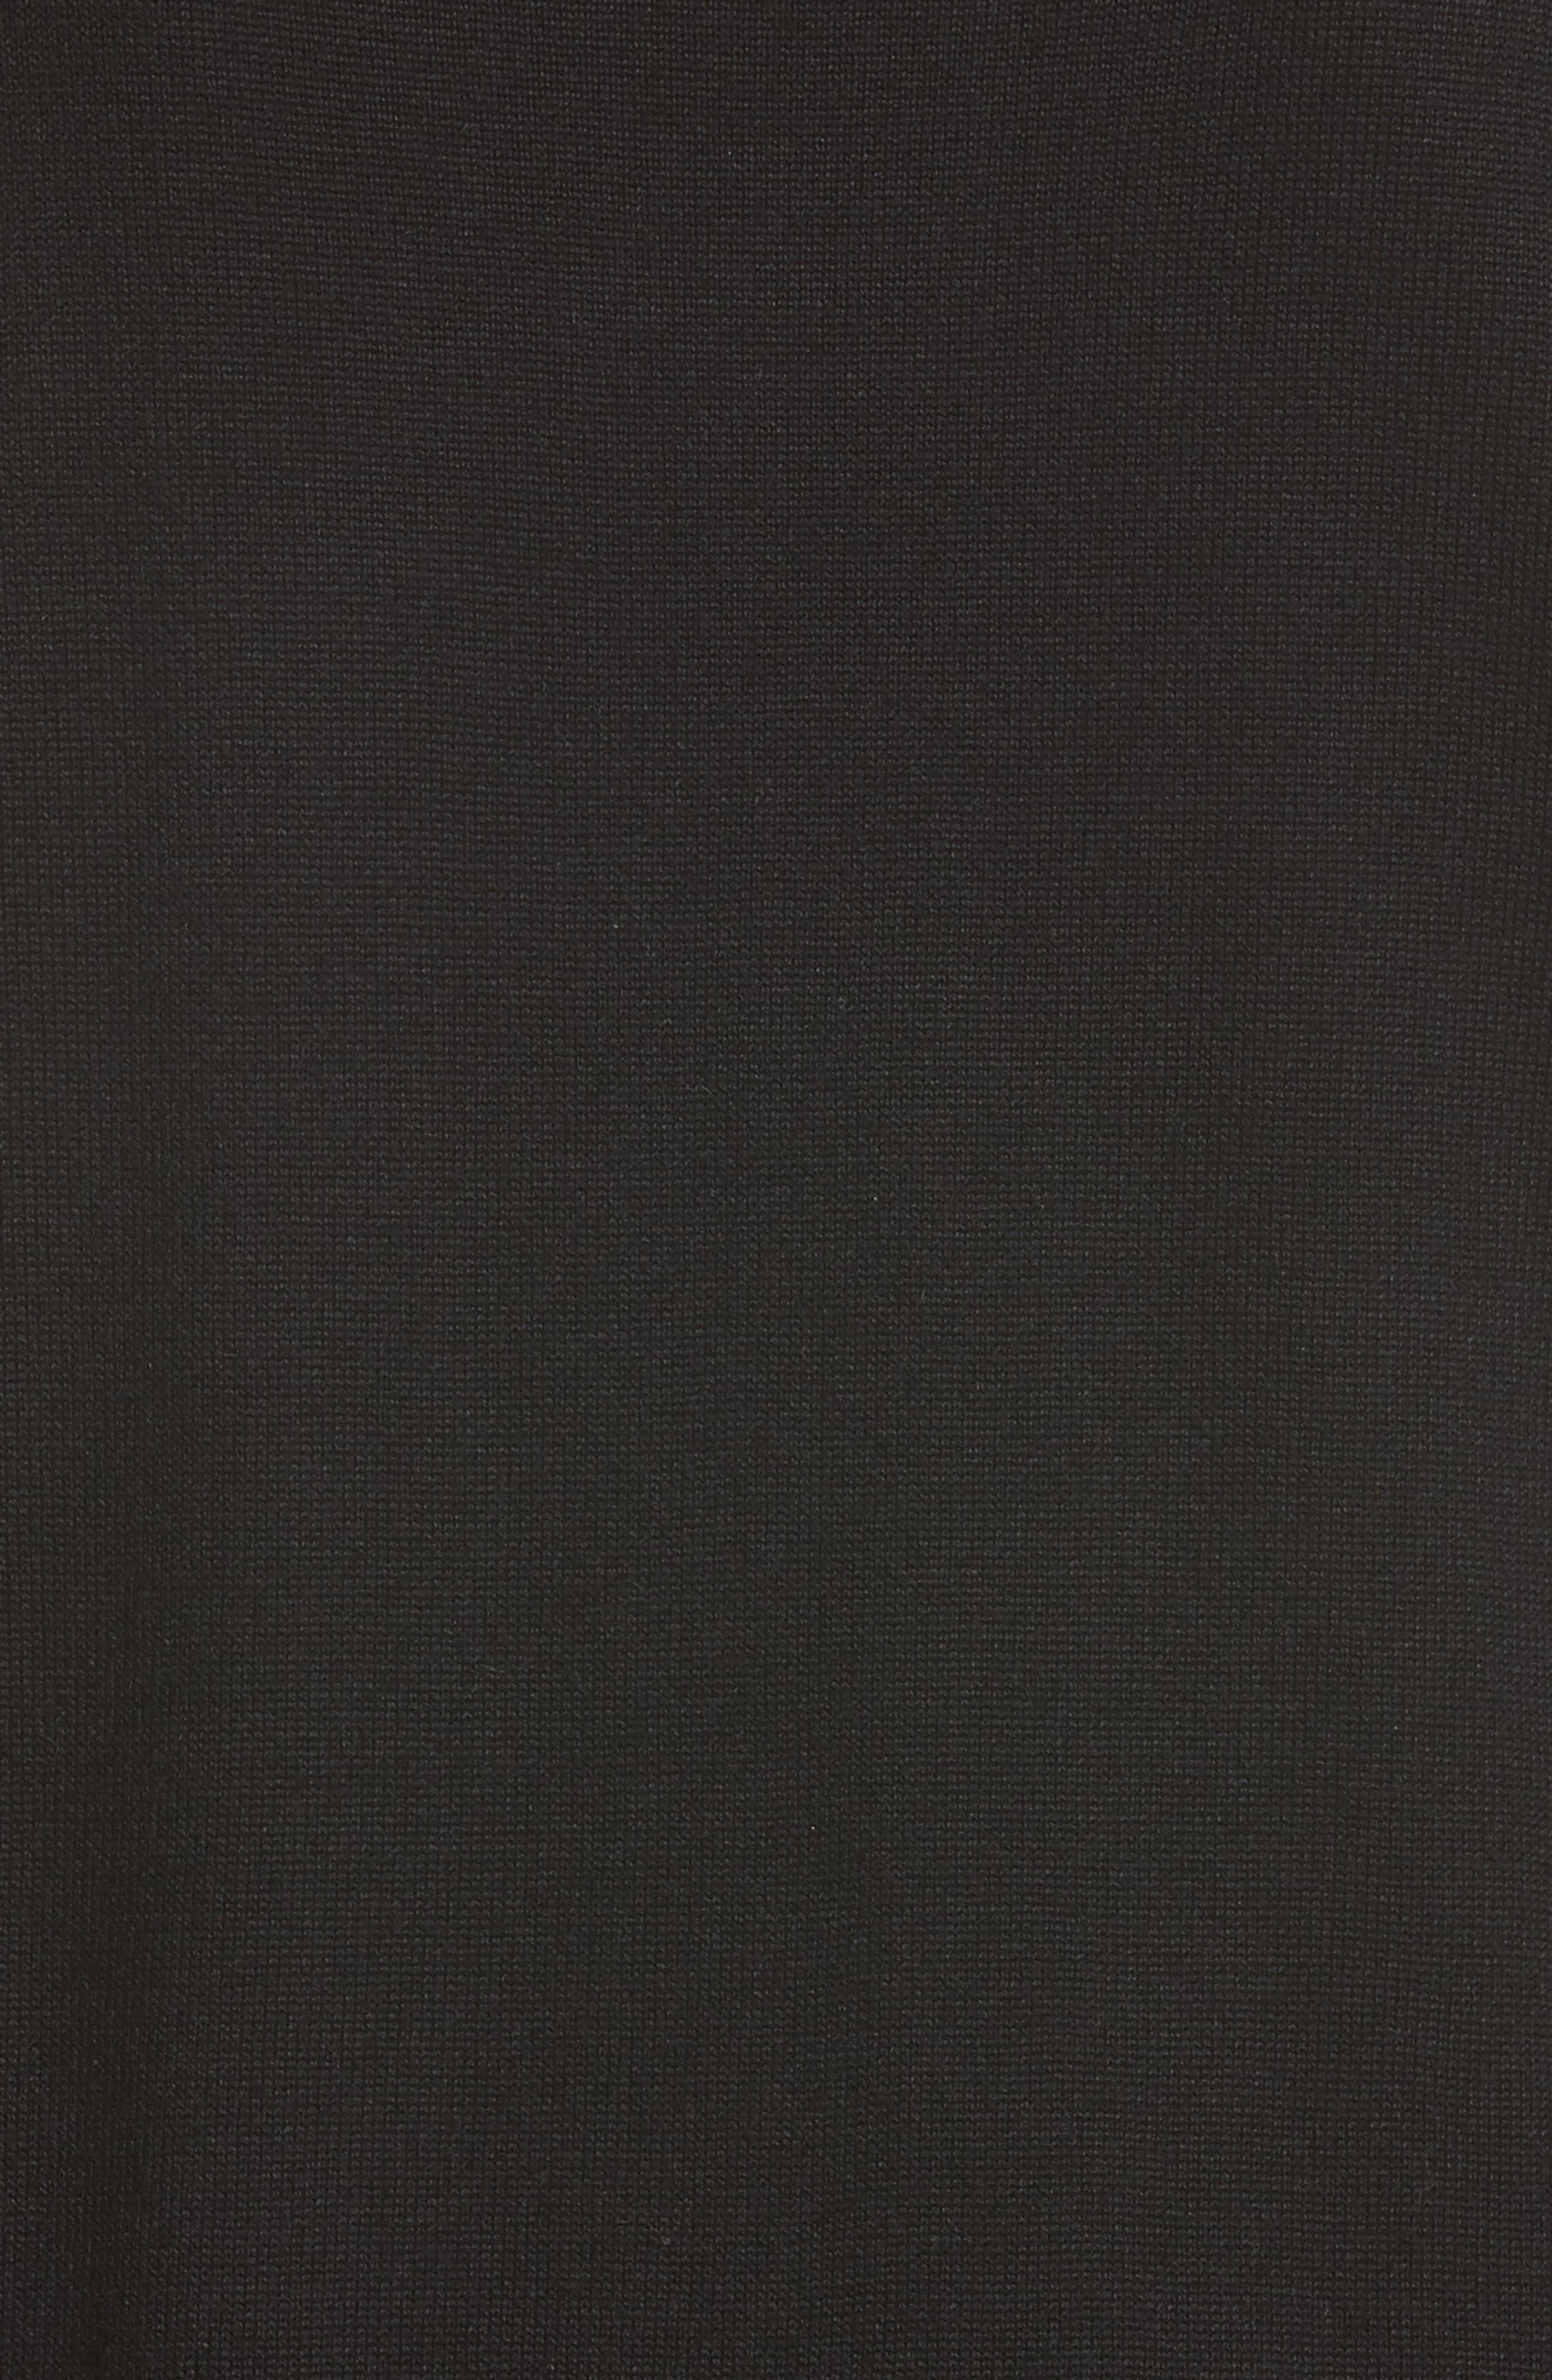 Asymmetrical Jersey Knit Sweater,                             Alternate thumbnail 5, color,                             001